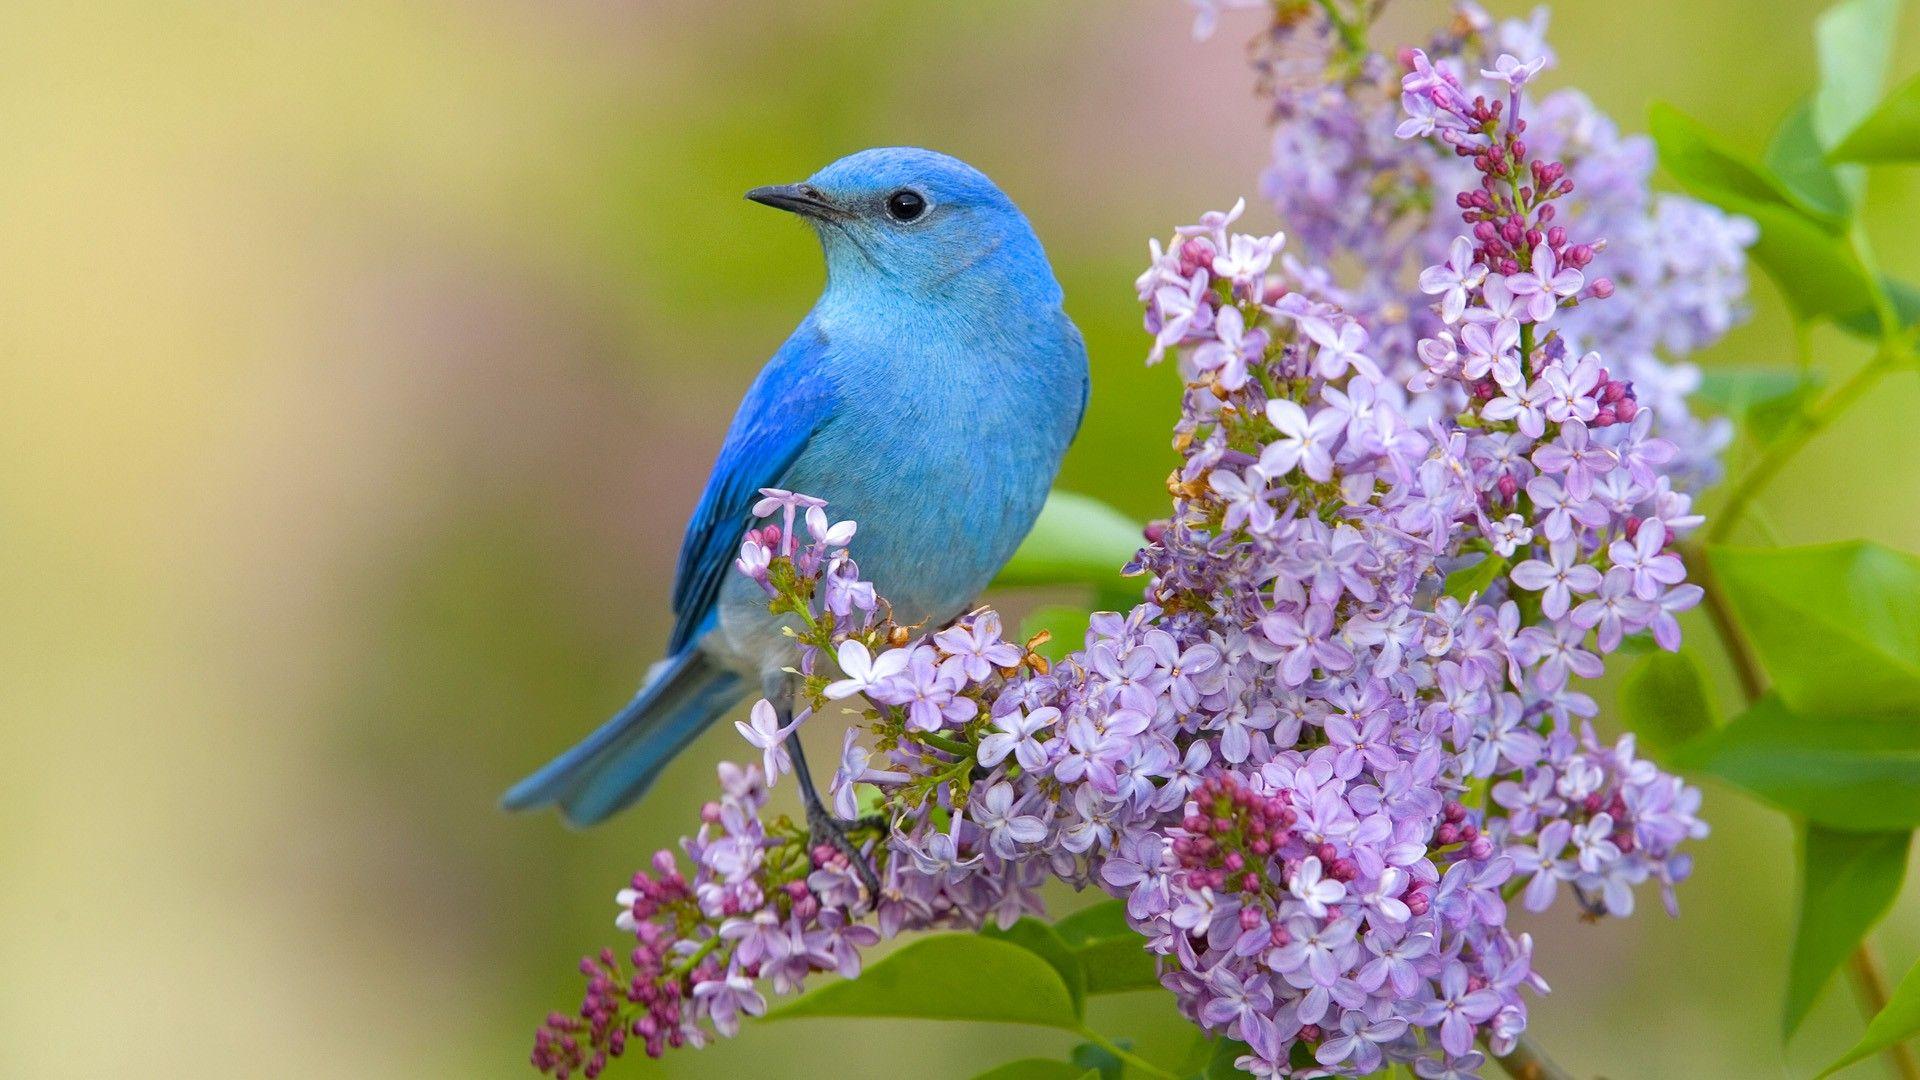 Birds Backgrounds Free Download Beautiful Birds Blue Bird Birds